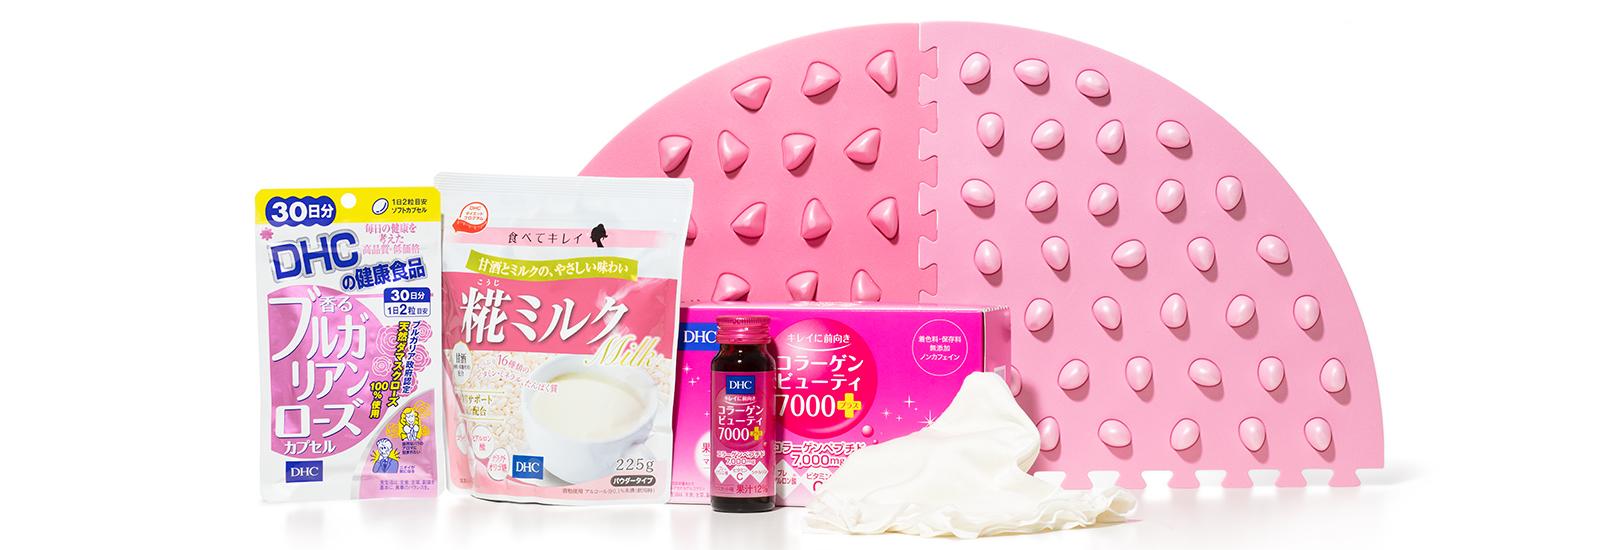 We Tried 5 Unique, Japan-exclusive DHC products